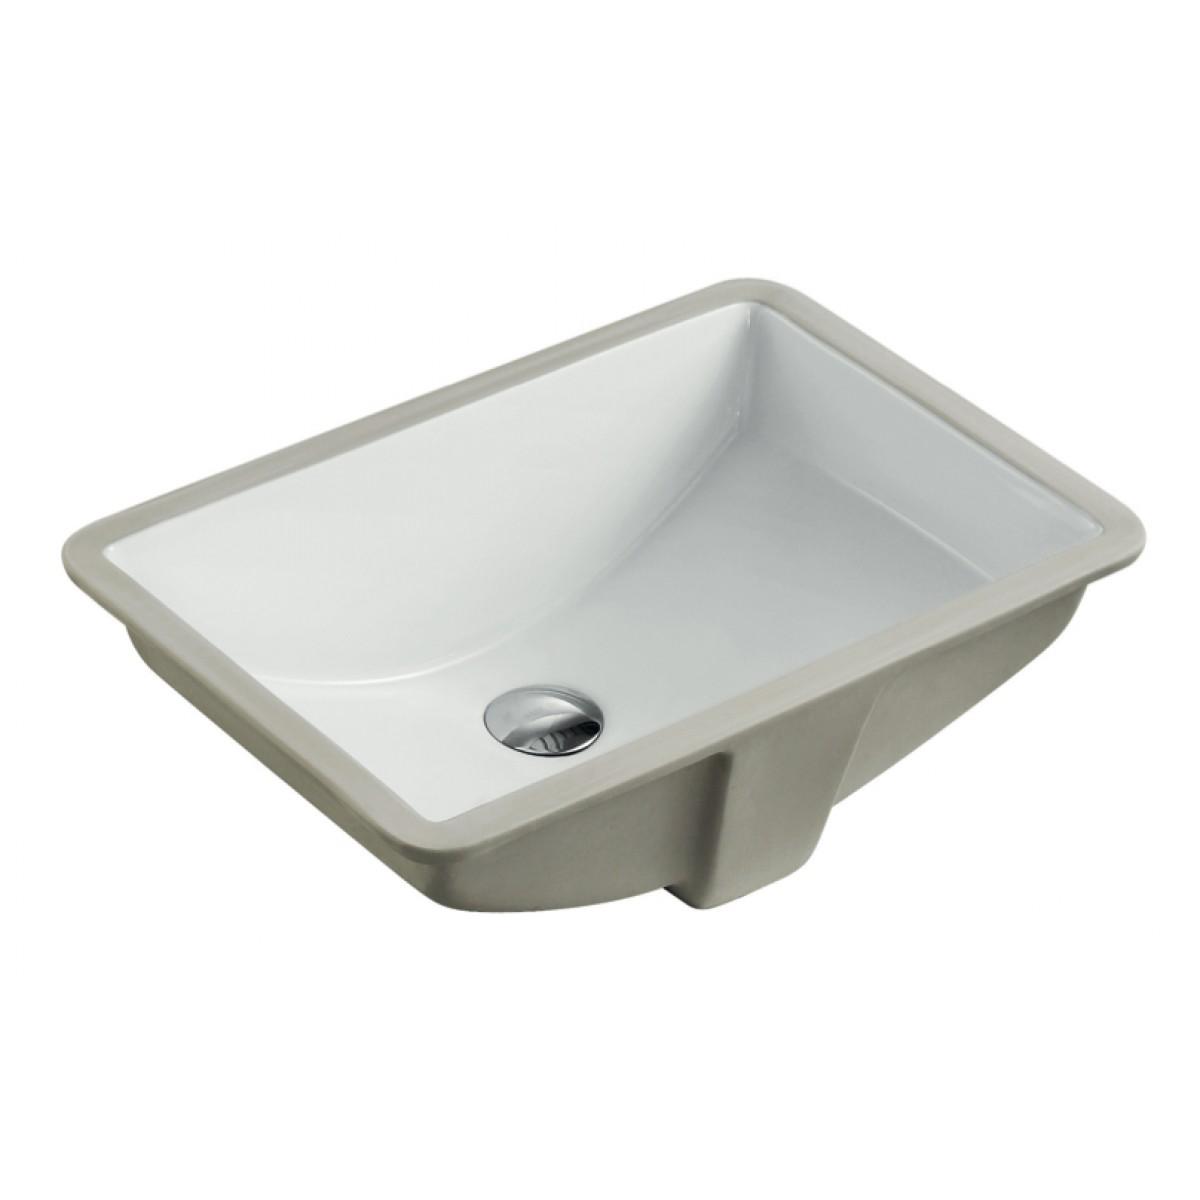 Rectangular white biscuit porcelain ceramic vanity - Undermount bathroom sinks rectangular ...